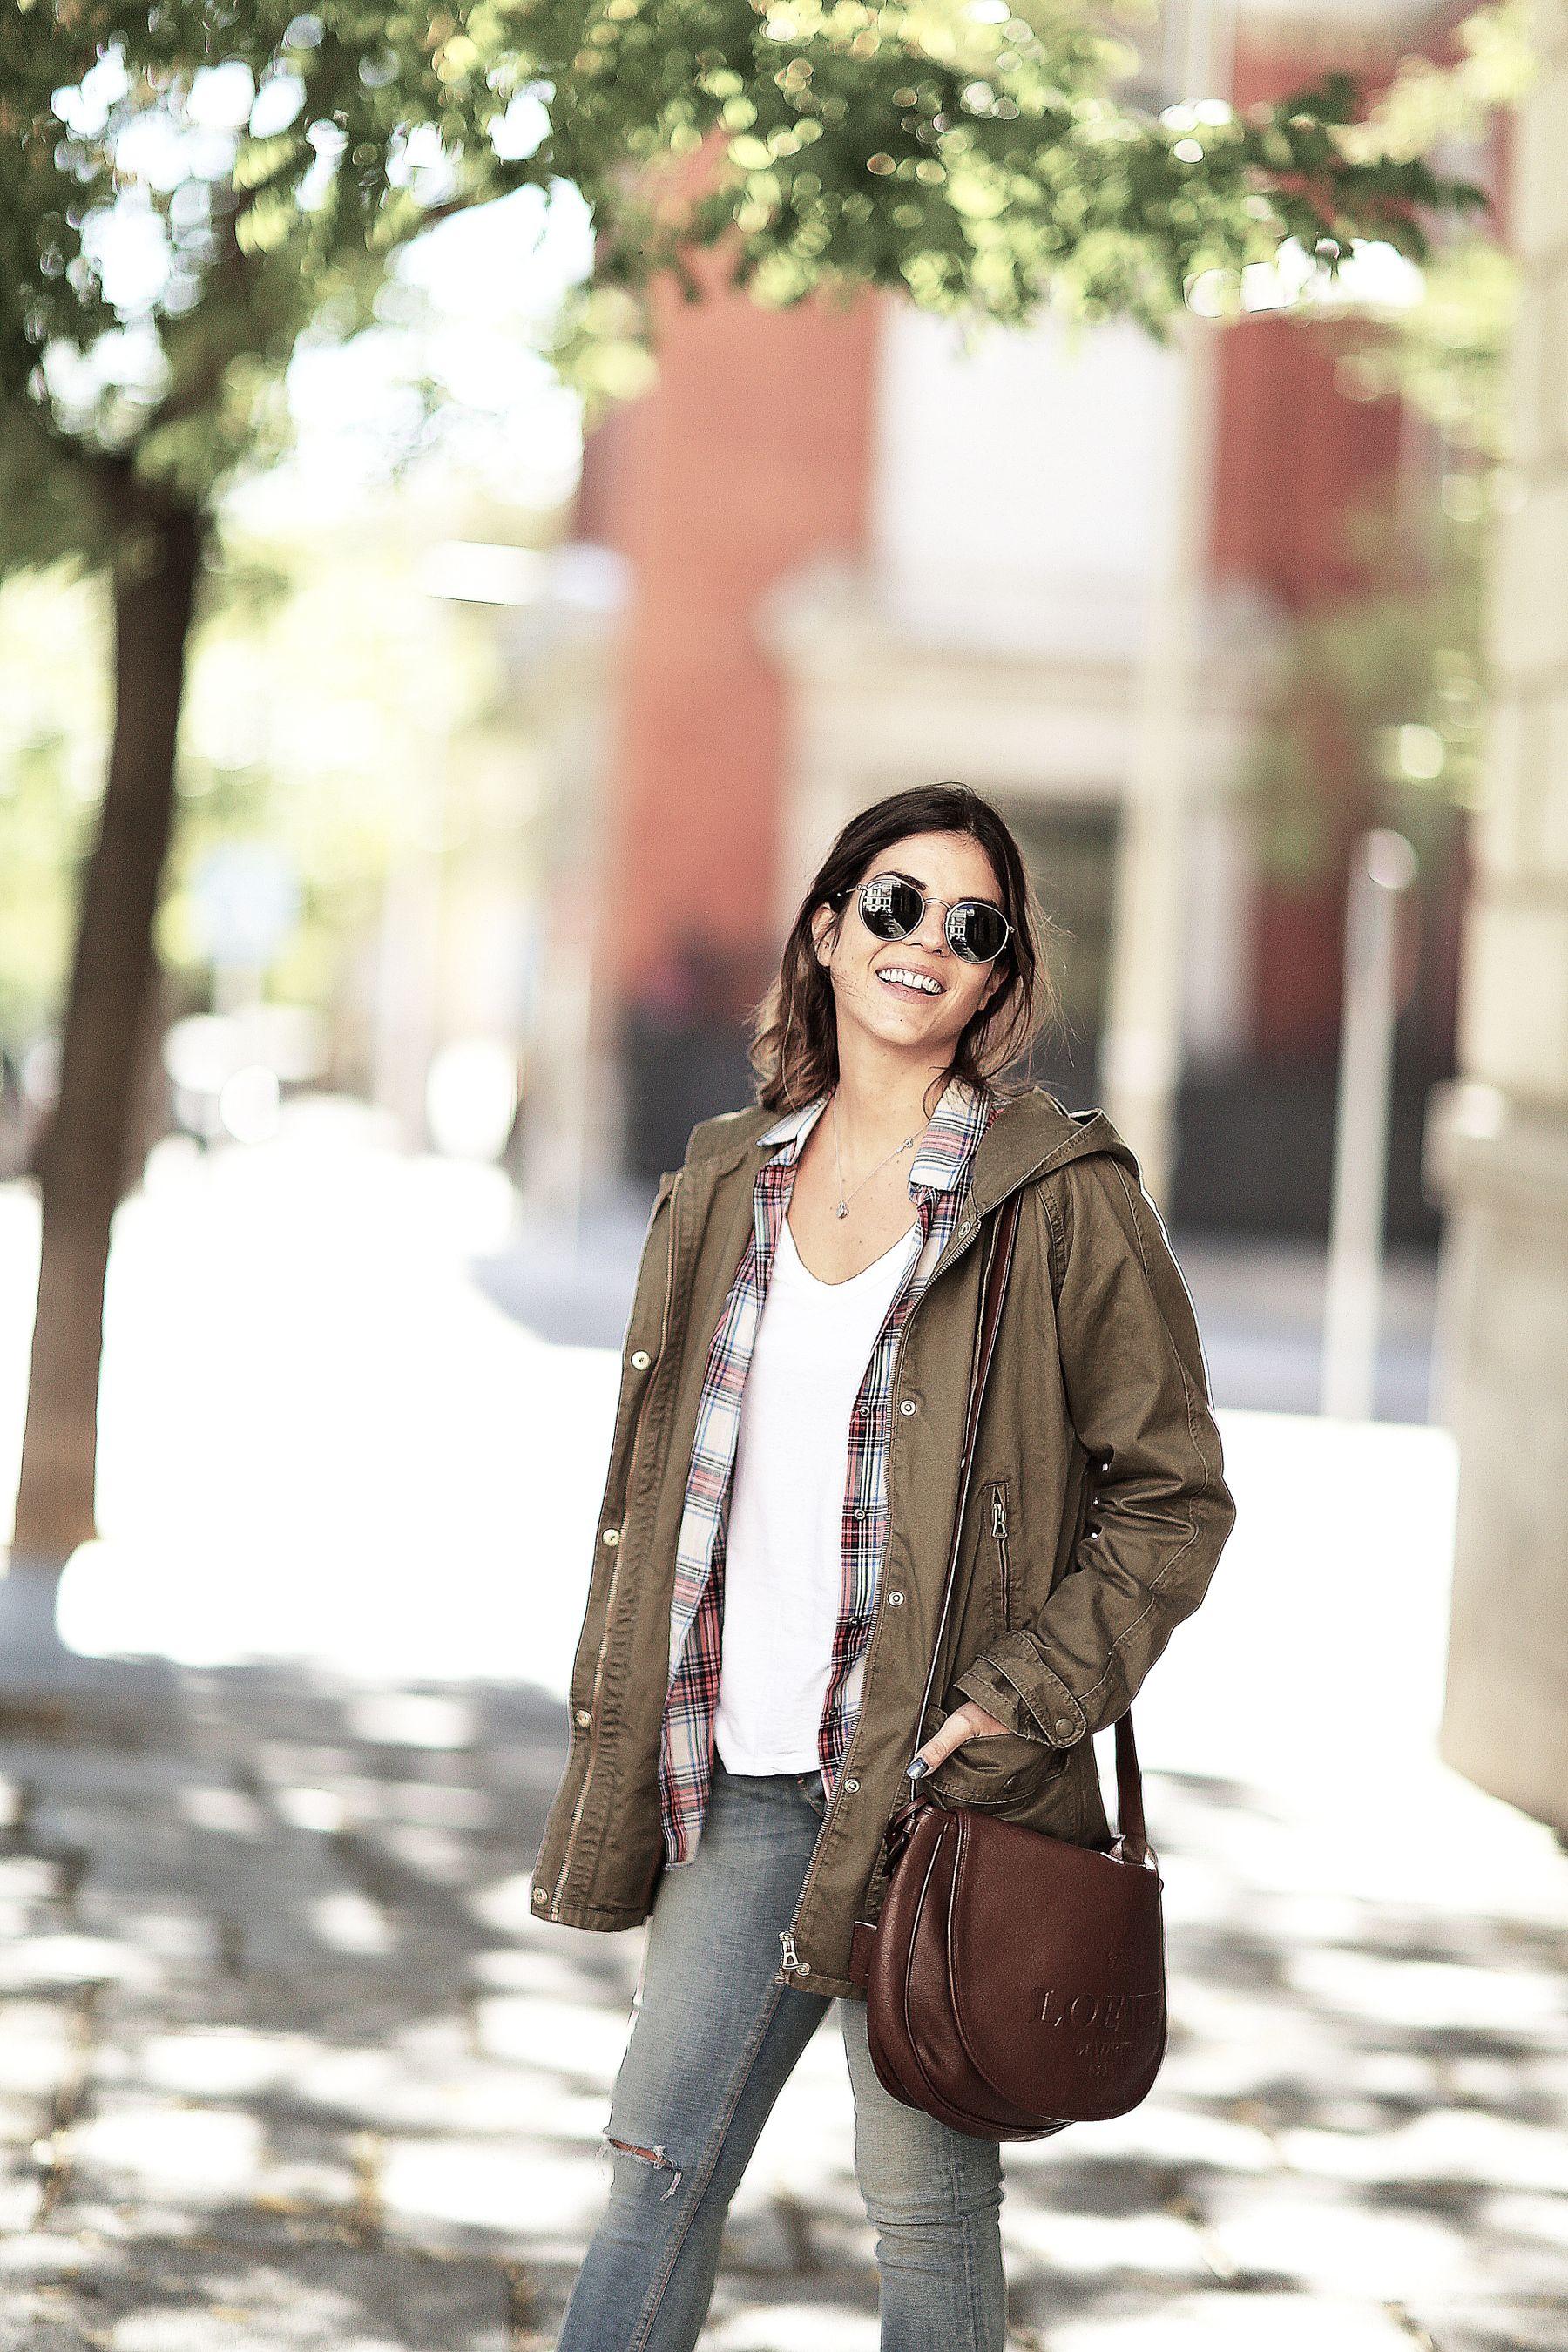 trendy-taste-look-outfit-street-style-trekking-tendencia-botas-parka-camisa-cuadros-plaid-shirt-fall-otoño-1